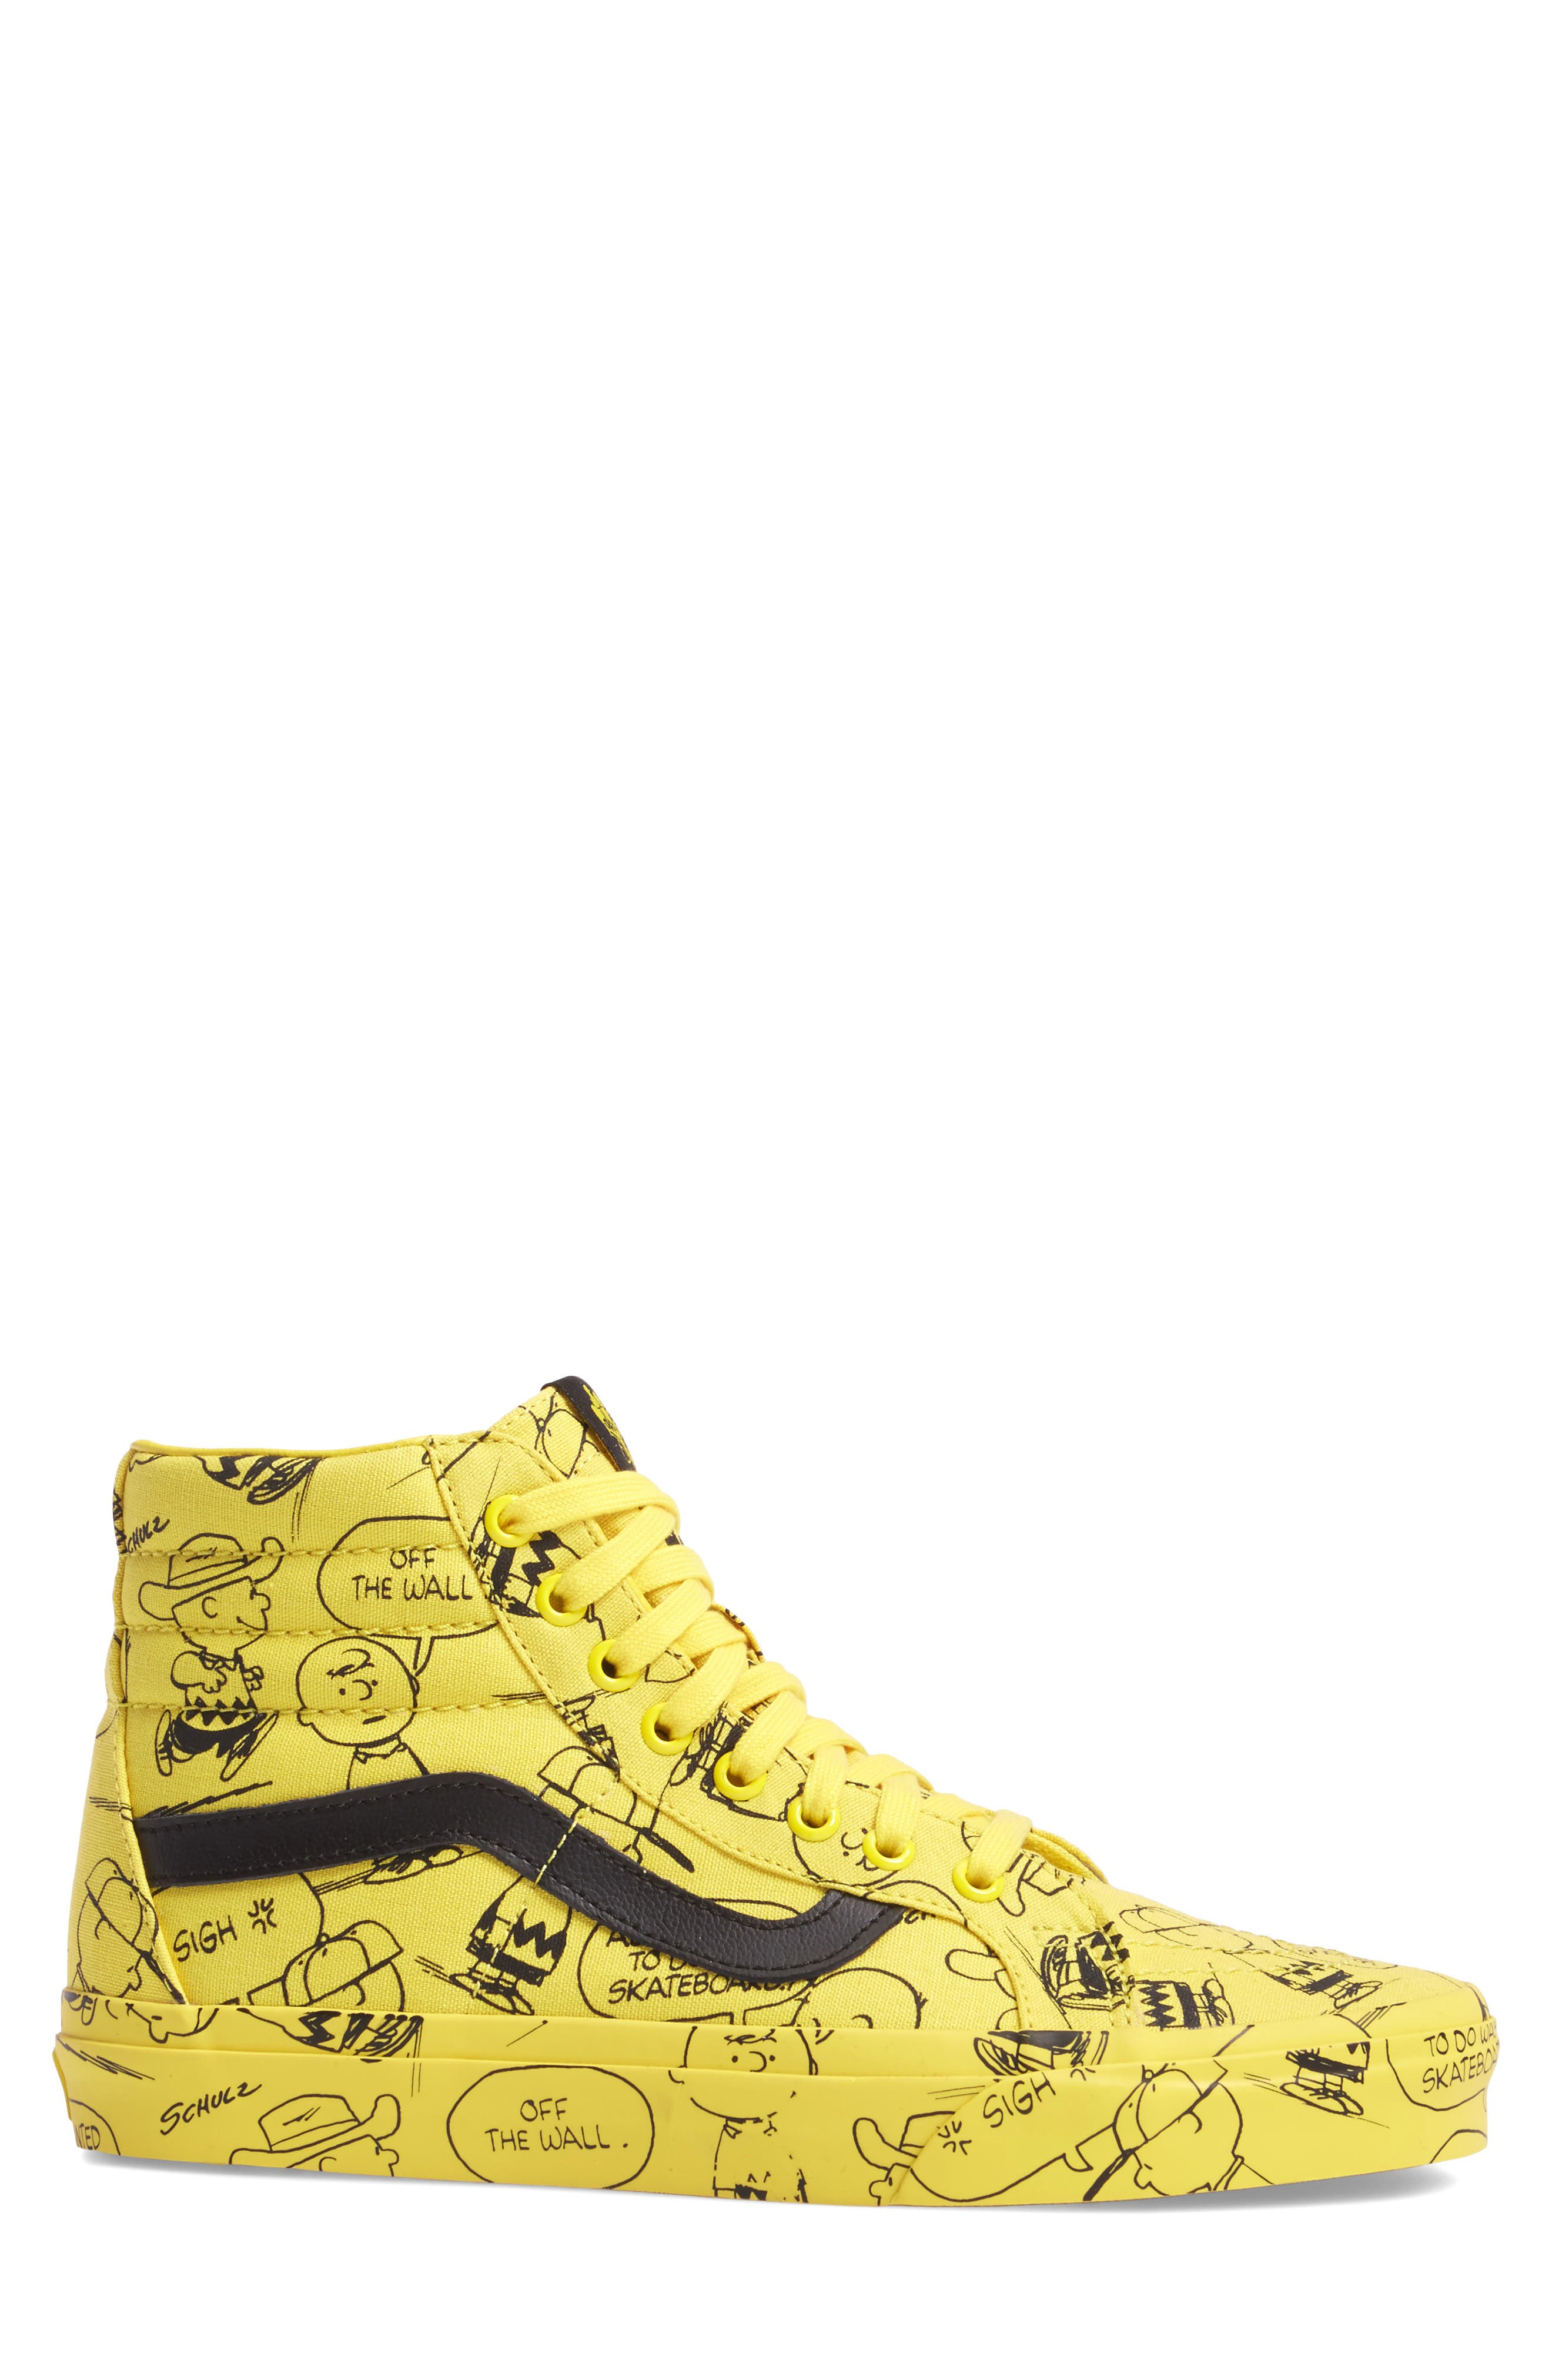 x Peanuts<sup>®</sup> Sk8-Hi Reissue Sneaker,                             Alternate thumbnail 3, color,                             Maize Canvas